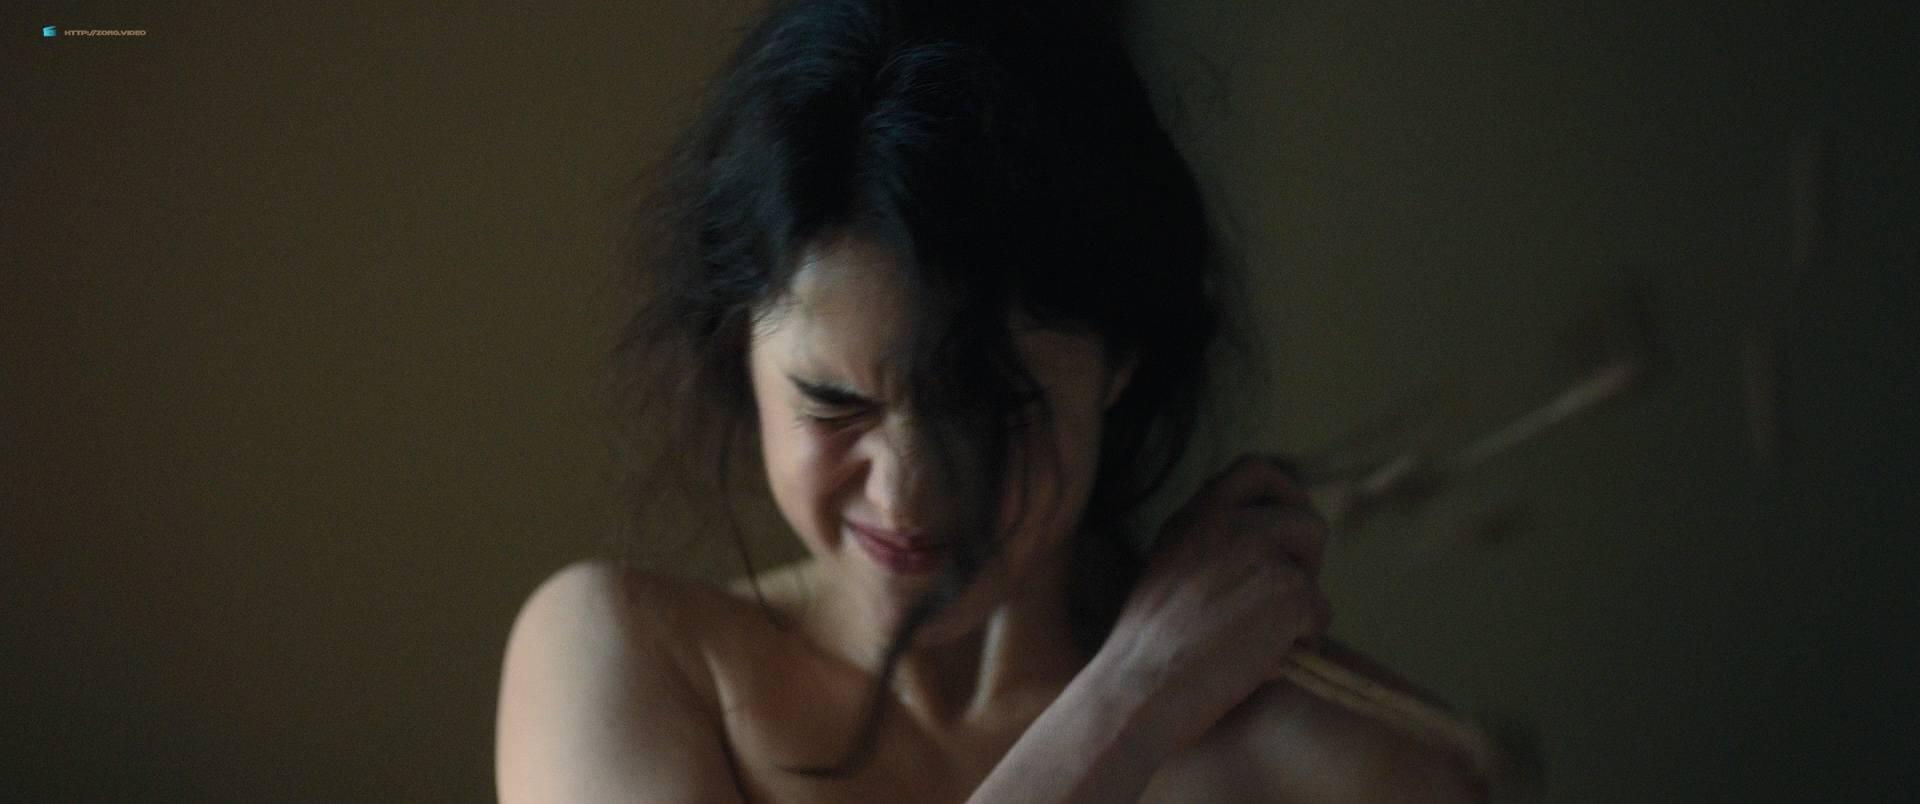 Margaret Qualley nude topless if her in brief scene - Novitiate (2017) HD 1080p BluRay (8)